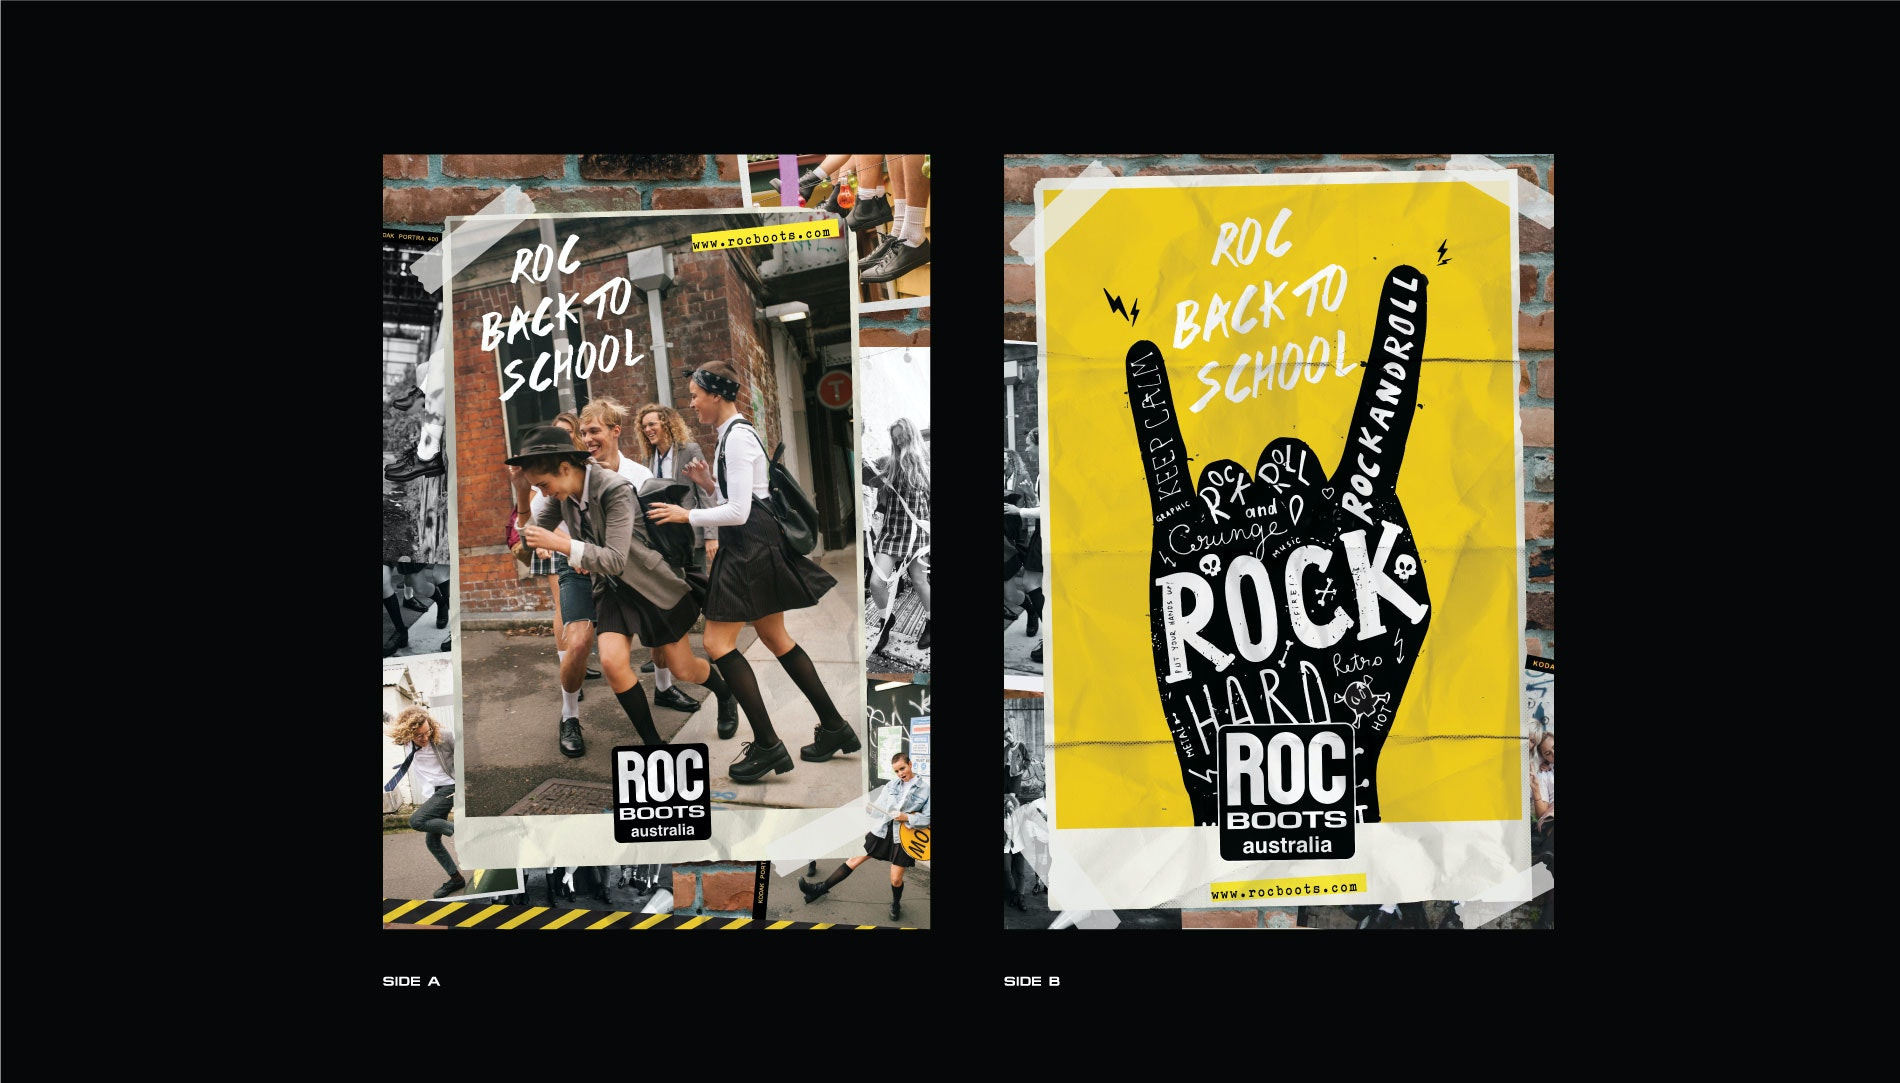 ALDAIN – Content Creator • Design • Sydney - a.austria_Design_ROC_BackToSchool-02